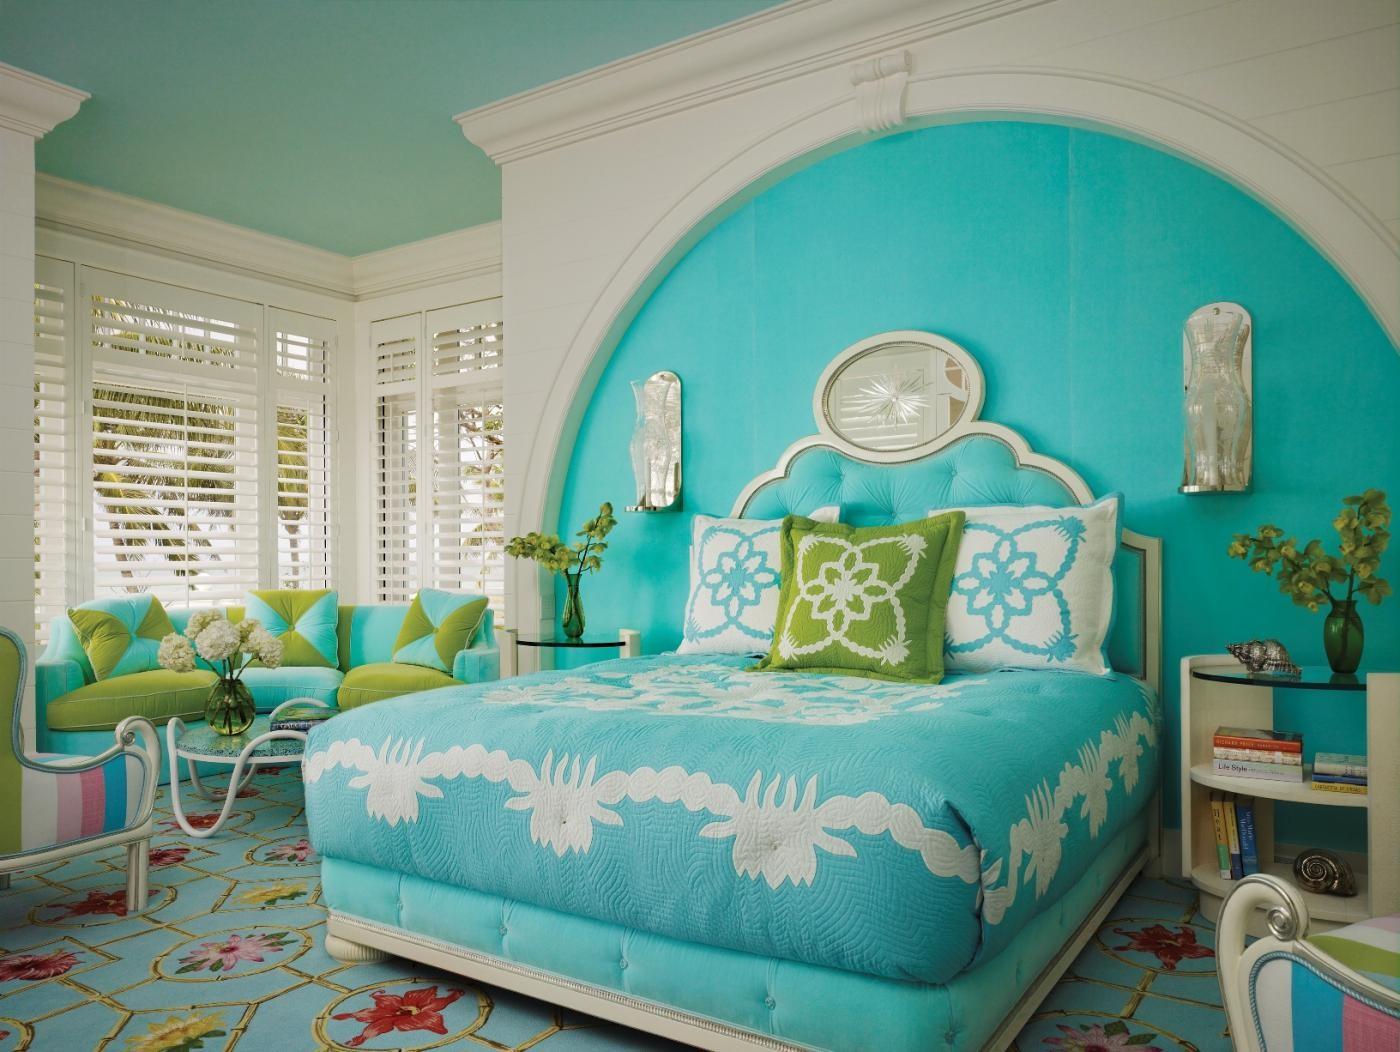 بالصور غرف نوم باللون التركواز- غرف نوم بالتركواز الفاتح